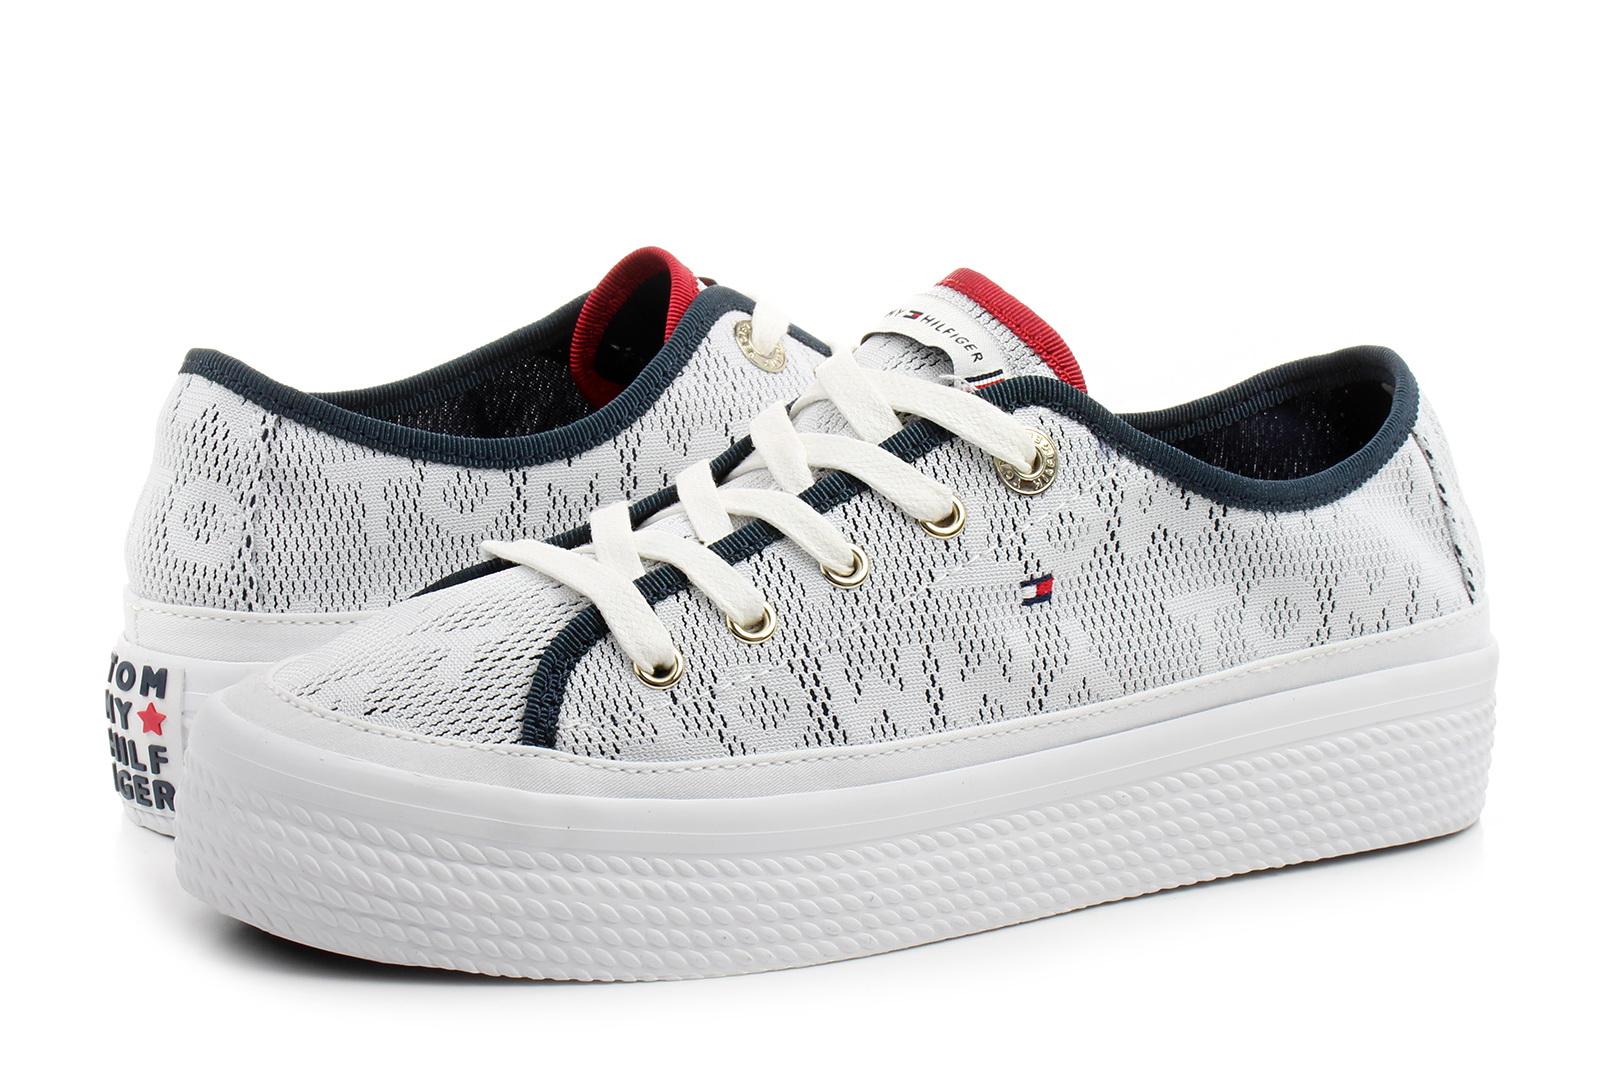 9e715ded5d Tommy Hilfiger Cipő - Kelsey 1d3 - 19S-4071-100 - Office Shoes ...